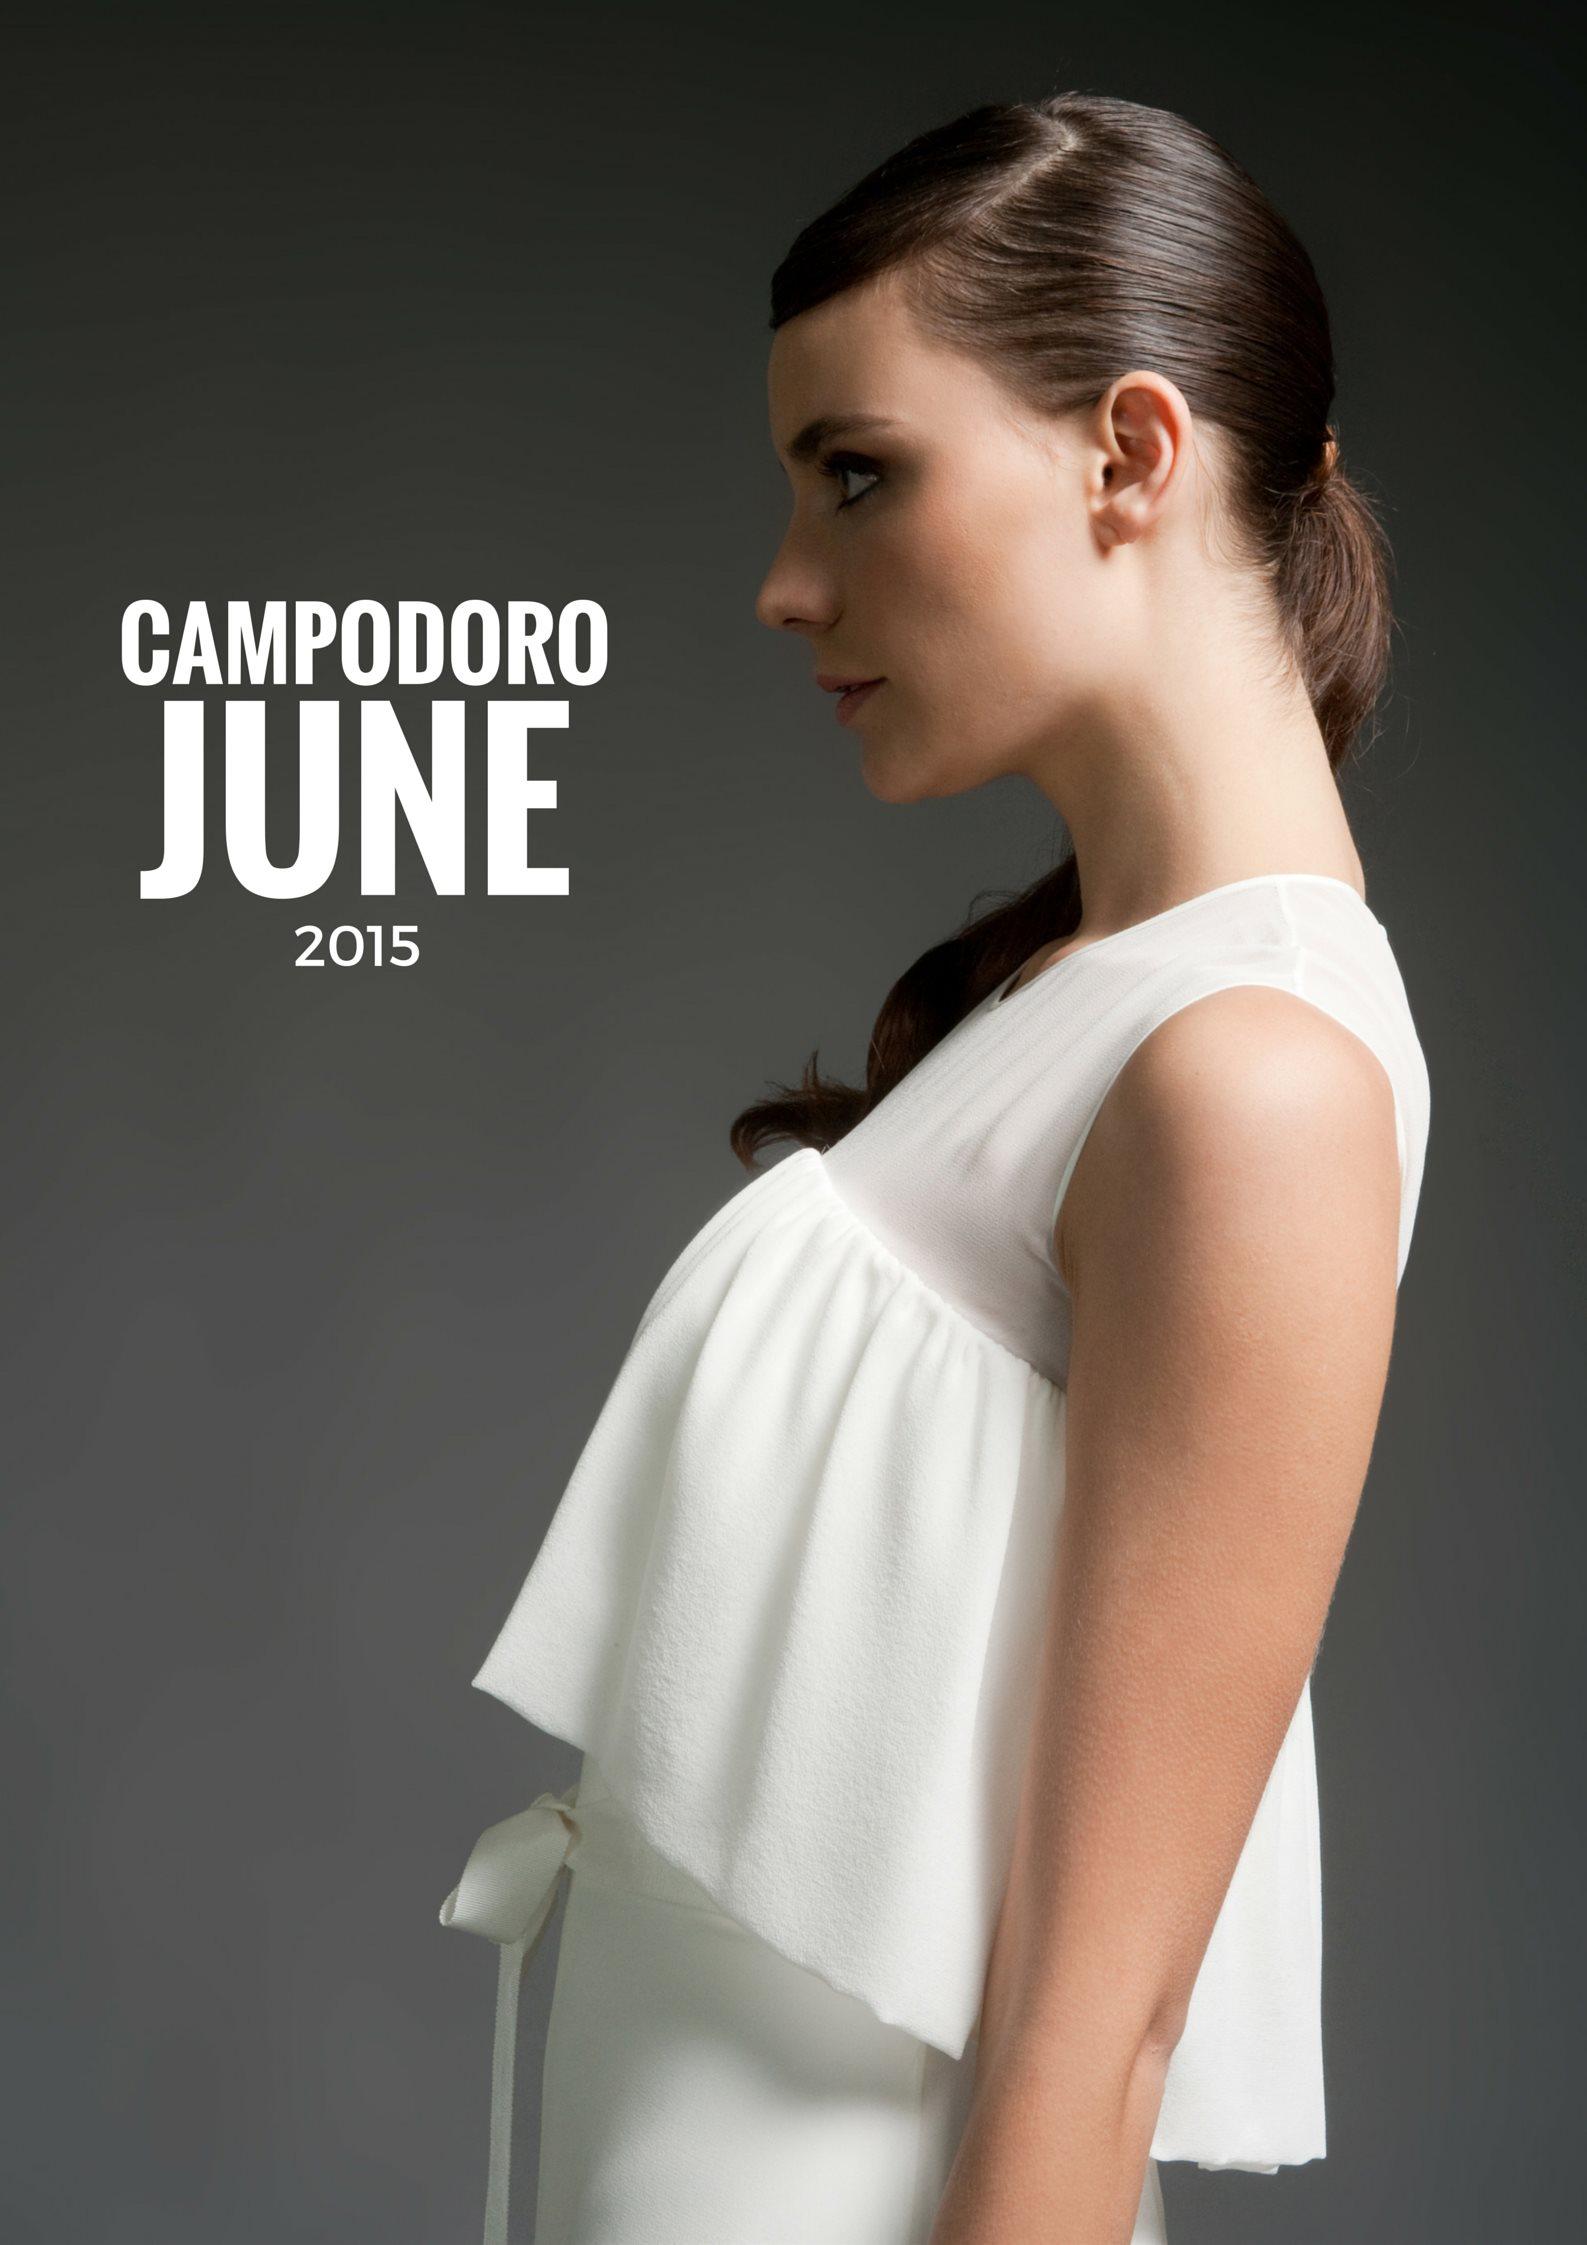 CampodoroJune.jpg